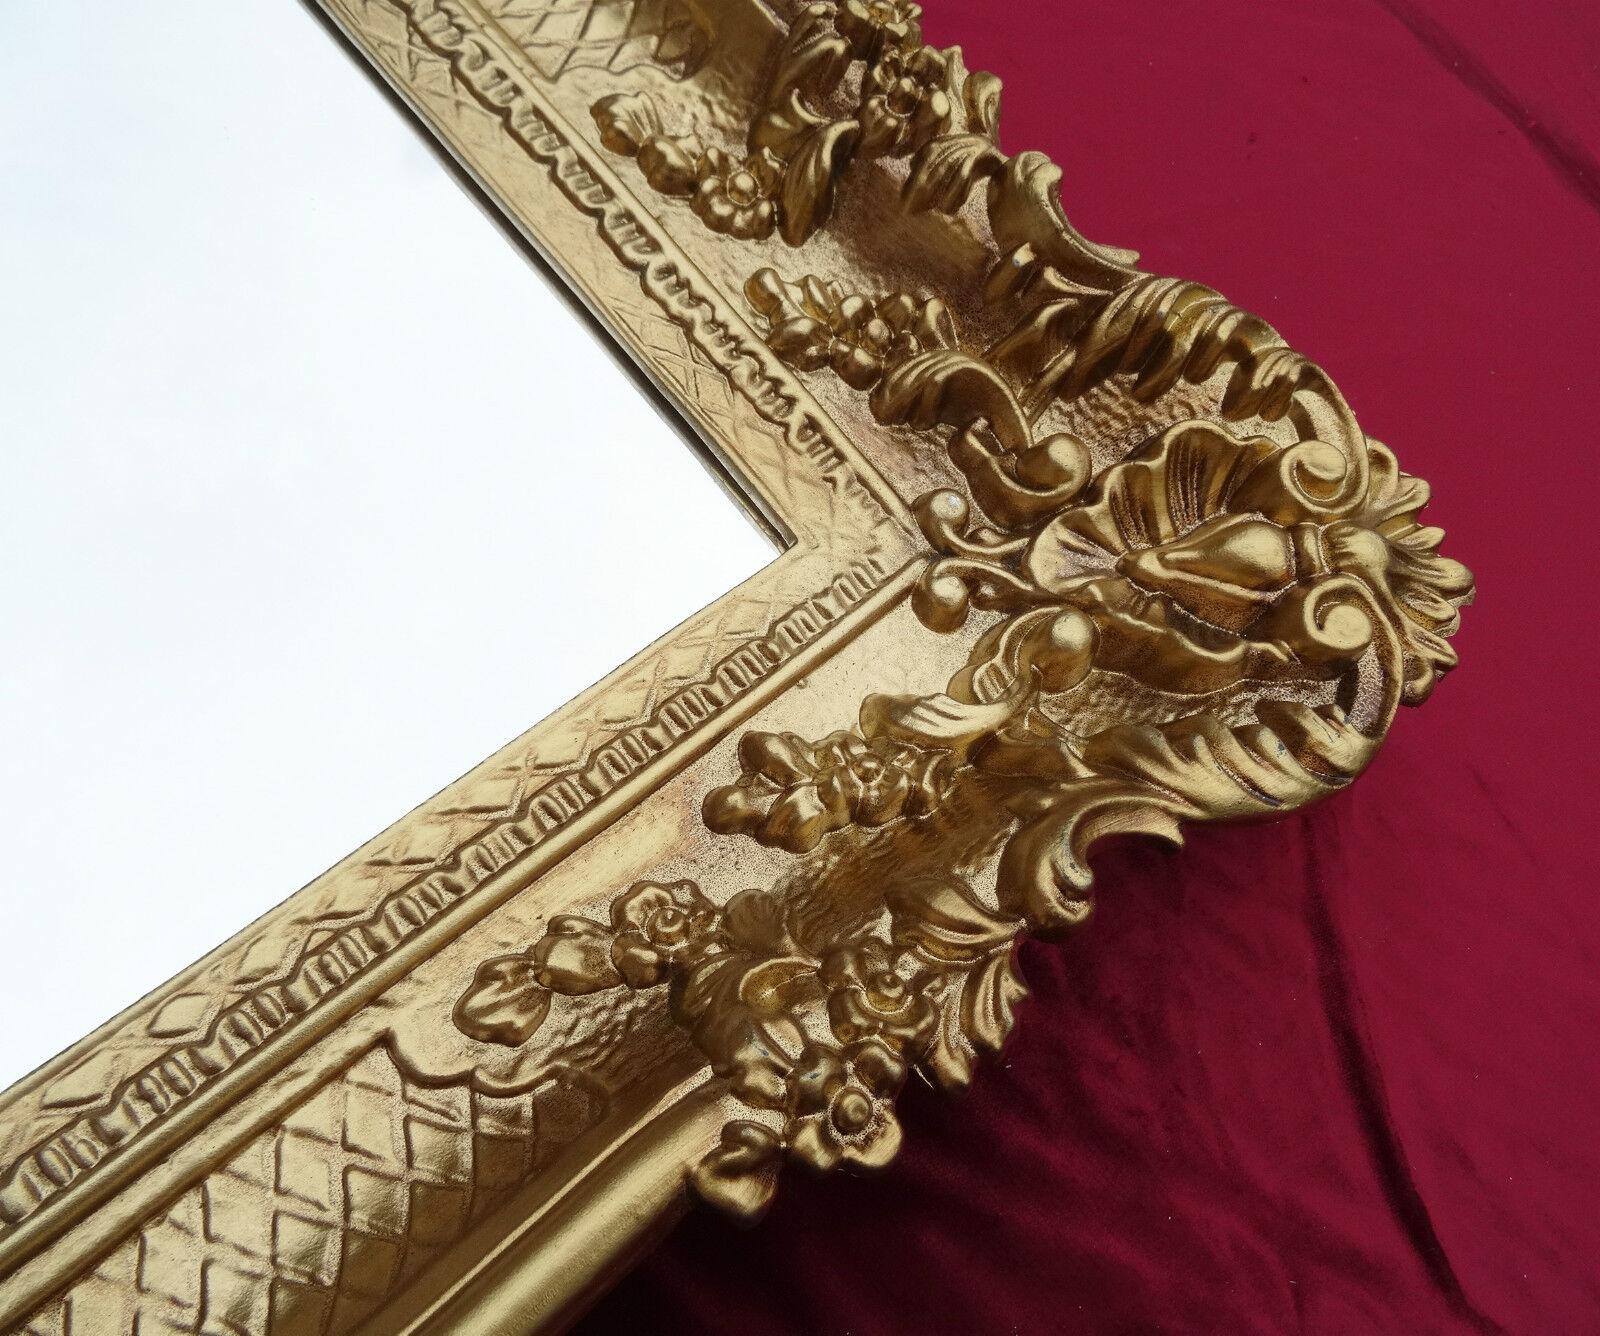 Wandspiegel gold 96x57 antik spiegel barock rokoko for Wandspiegel barok